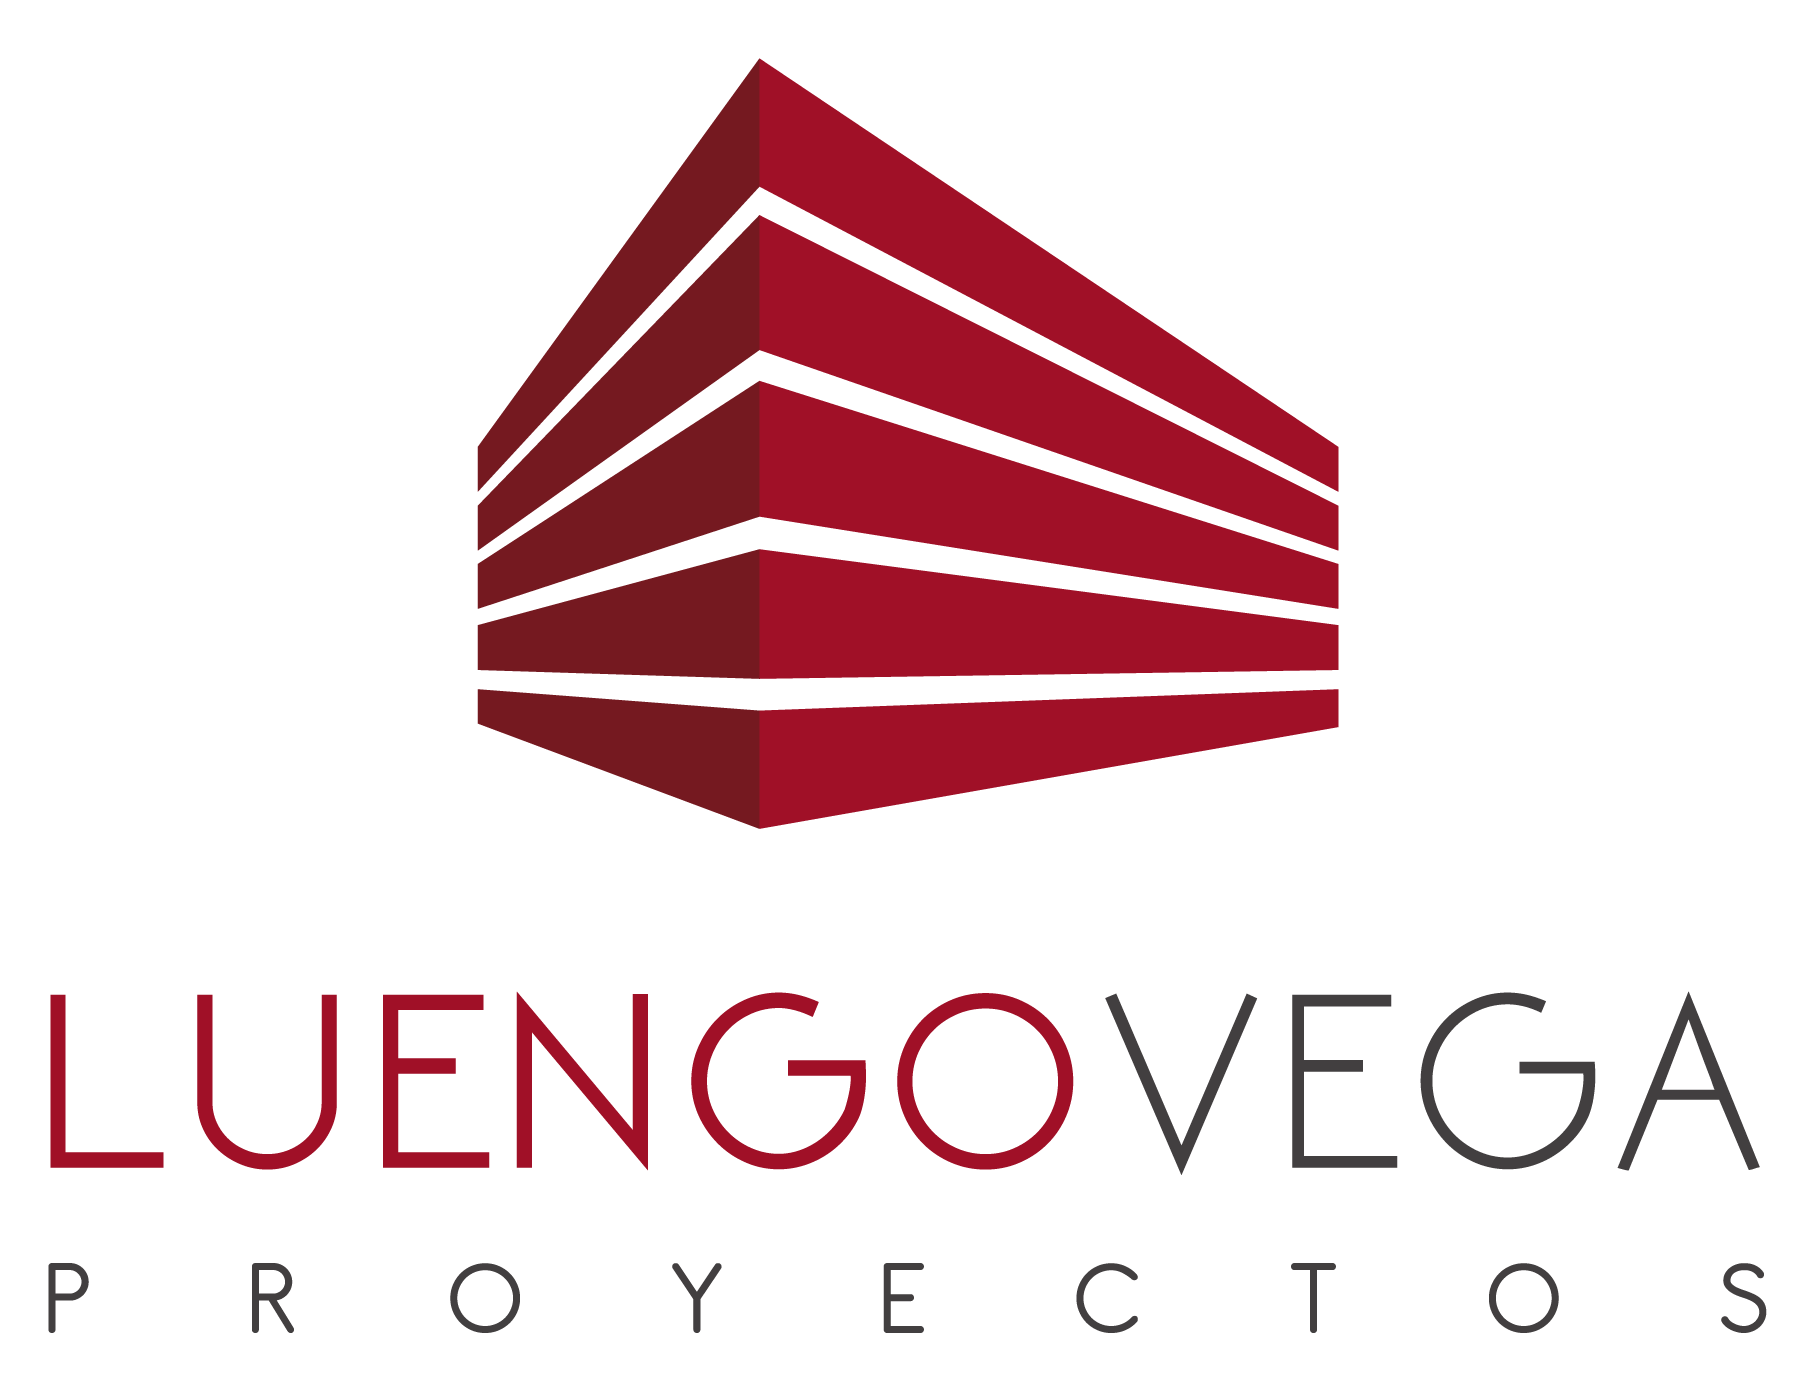 Proyectos Luengo Vega